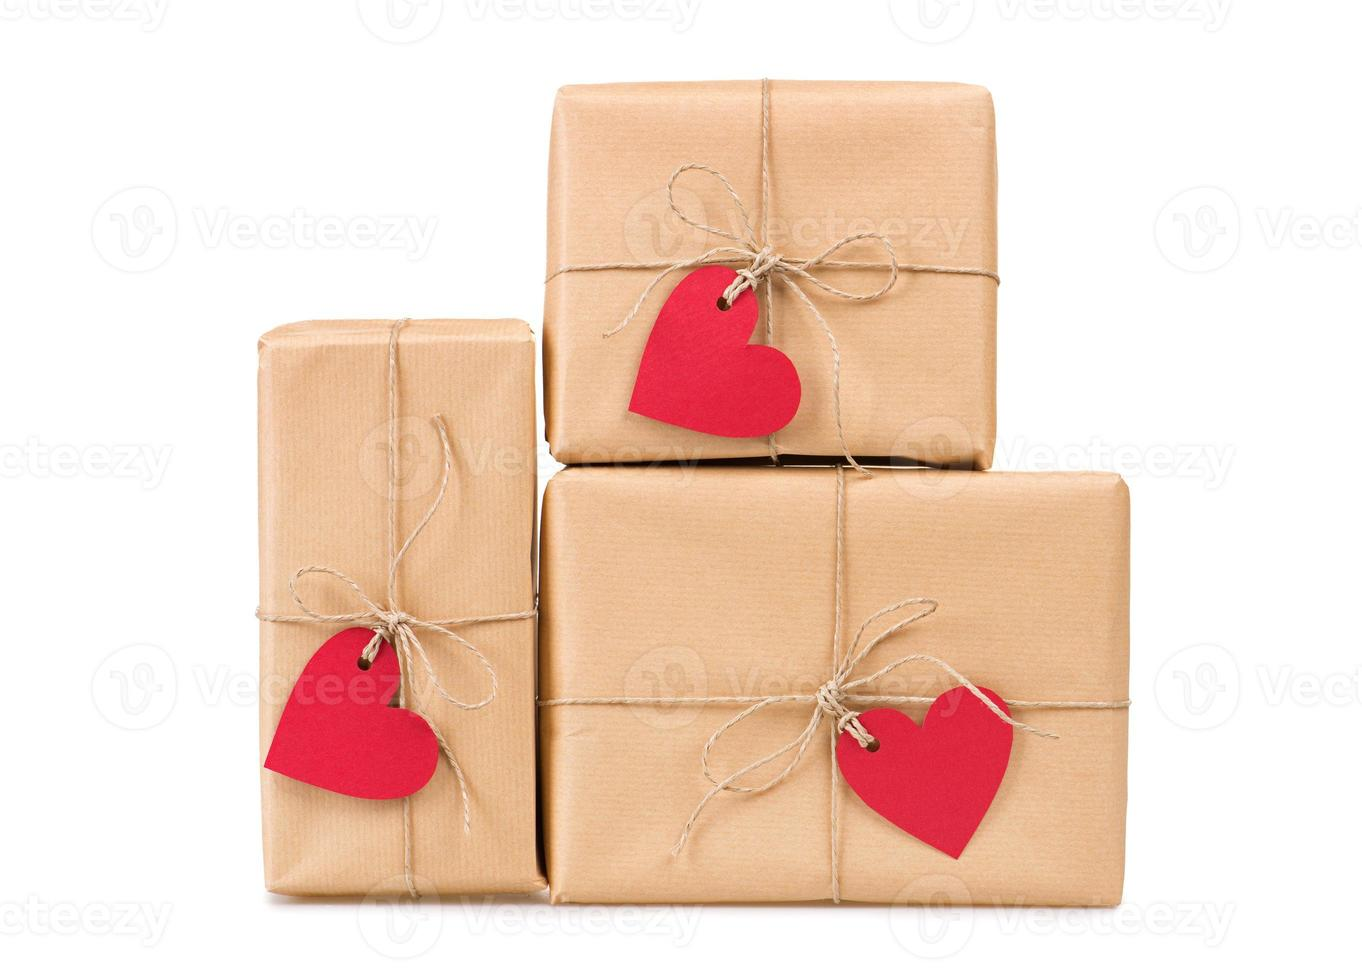 Geschenkboxen herzförmige Etiketten foto